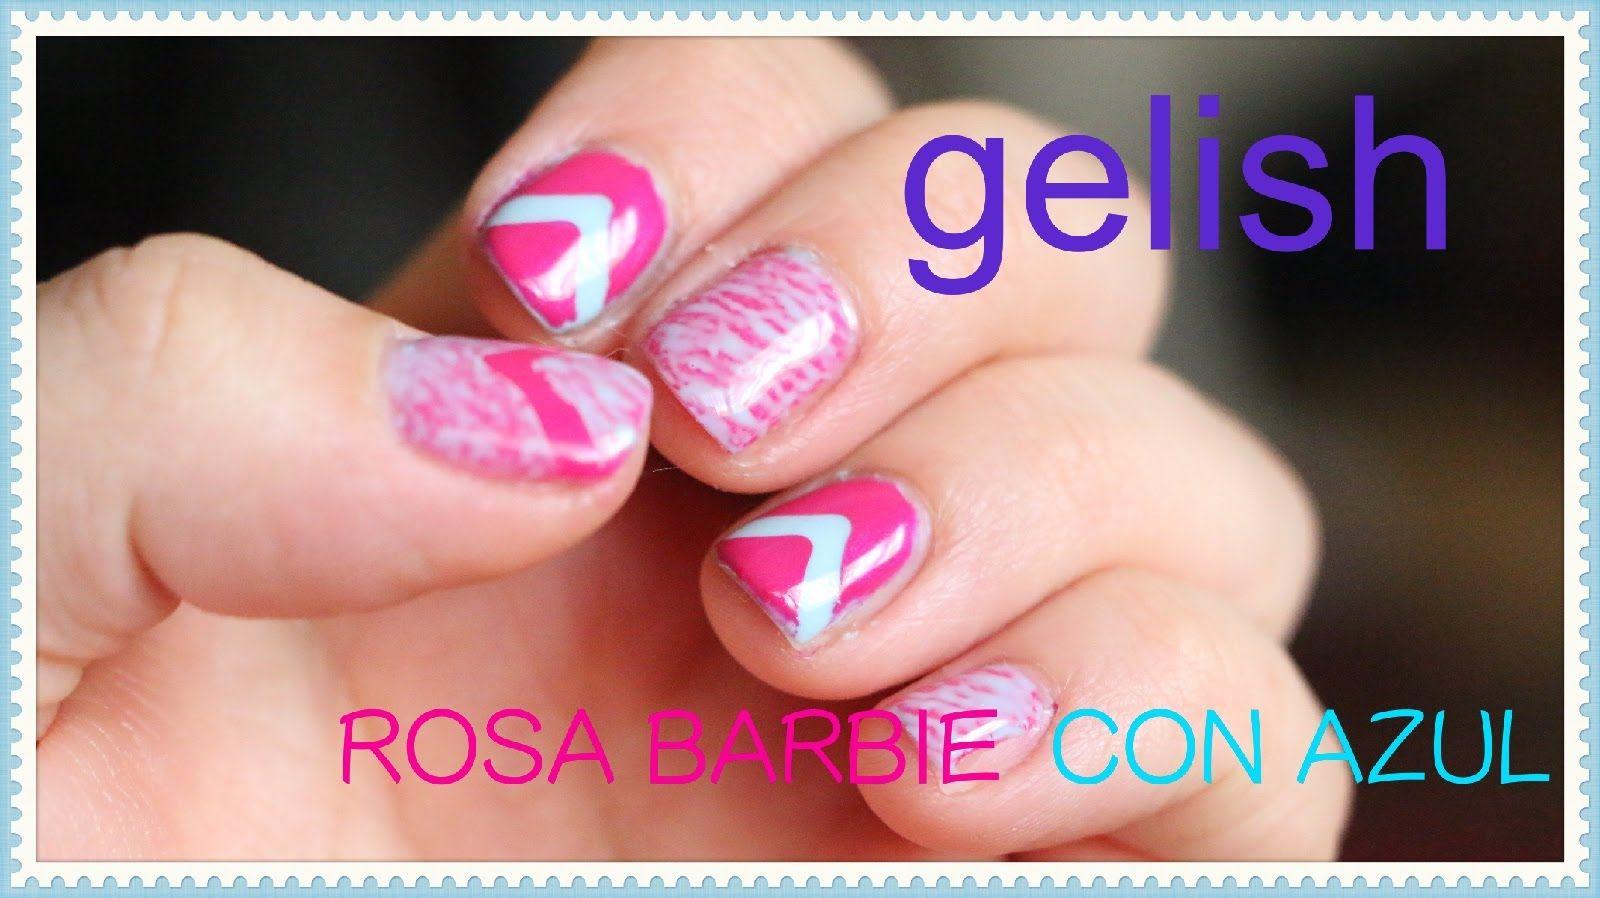 gelish color rosa barbie con azul gelish pinterest barbie